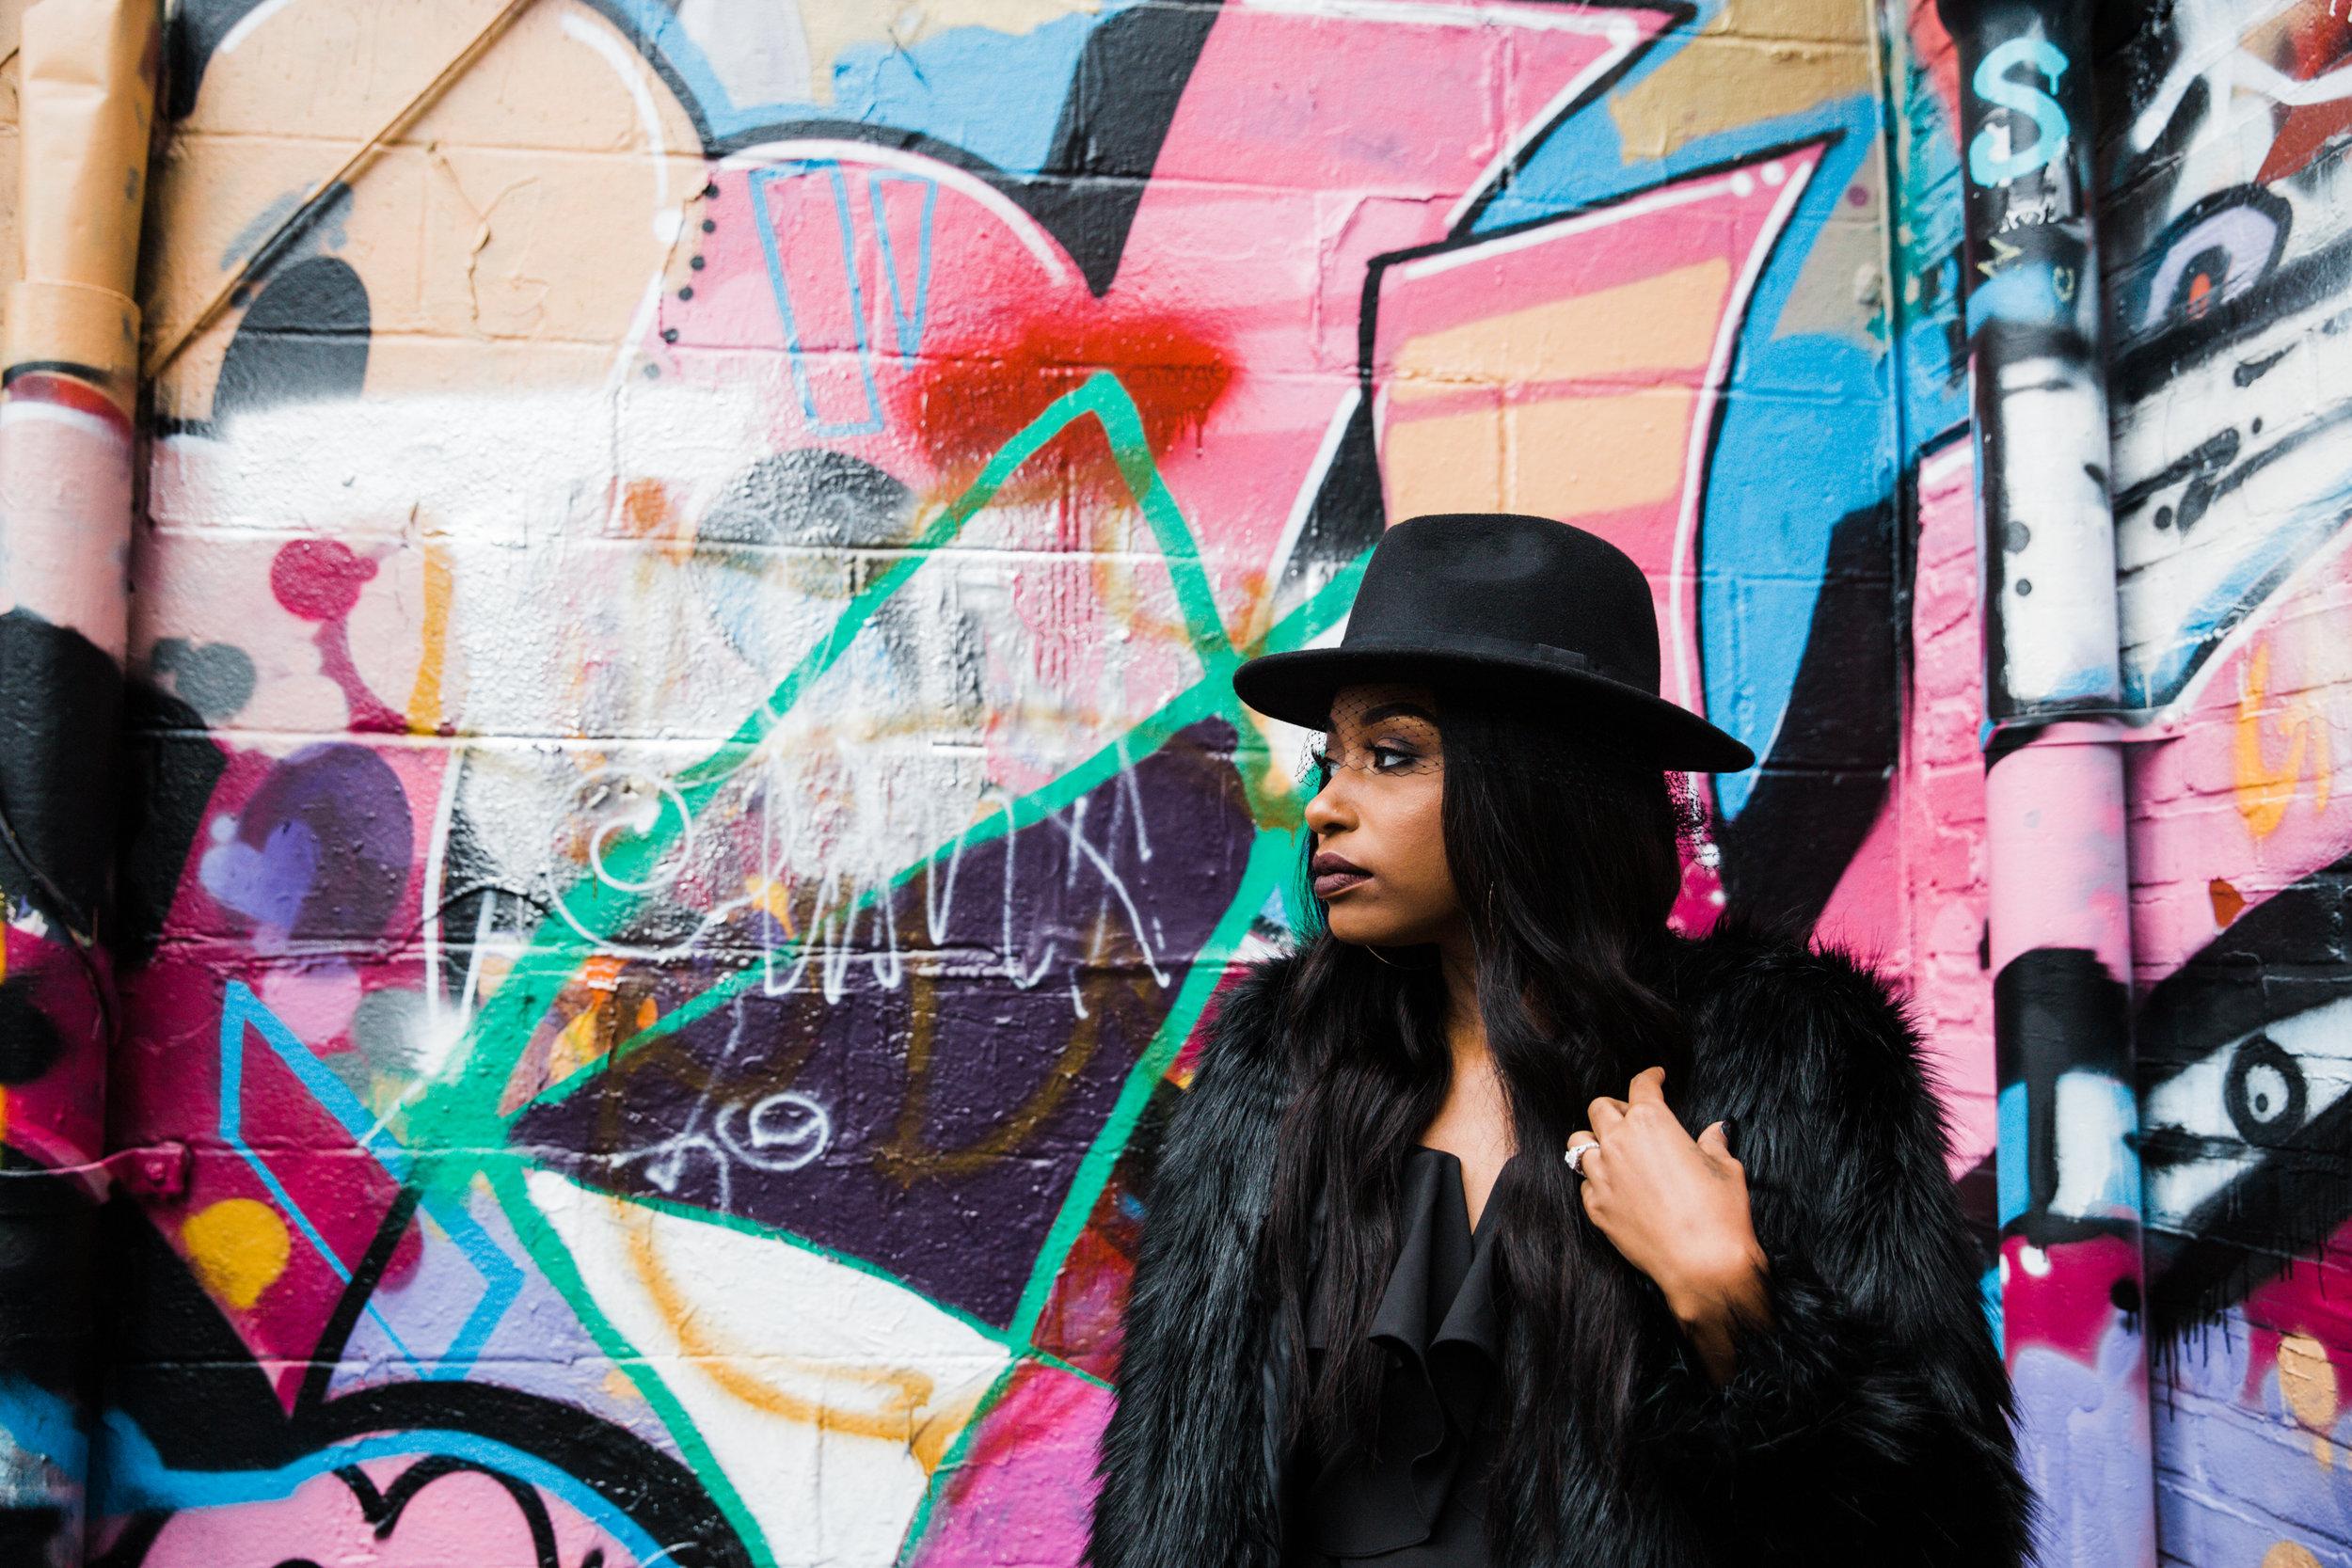 Creative Baltimore Graffiti Alley Engagement Session Megapixels Media Photography-31.jpg